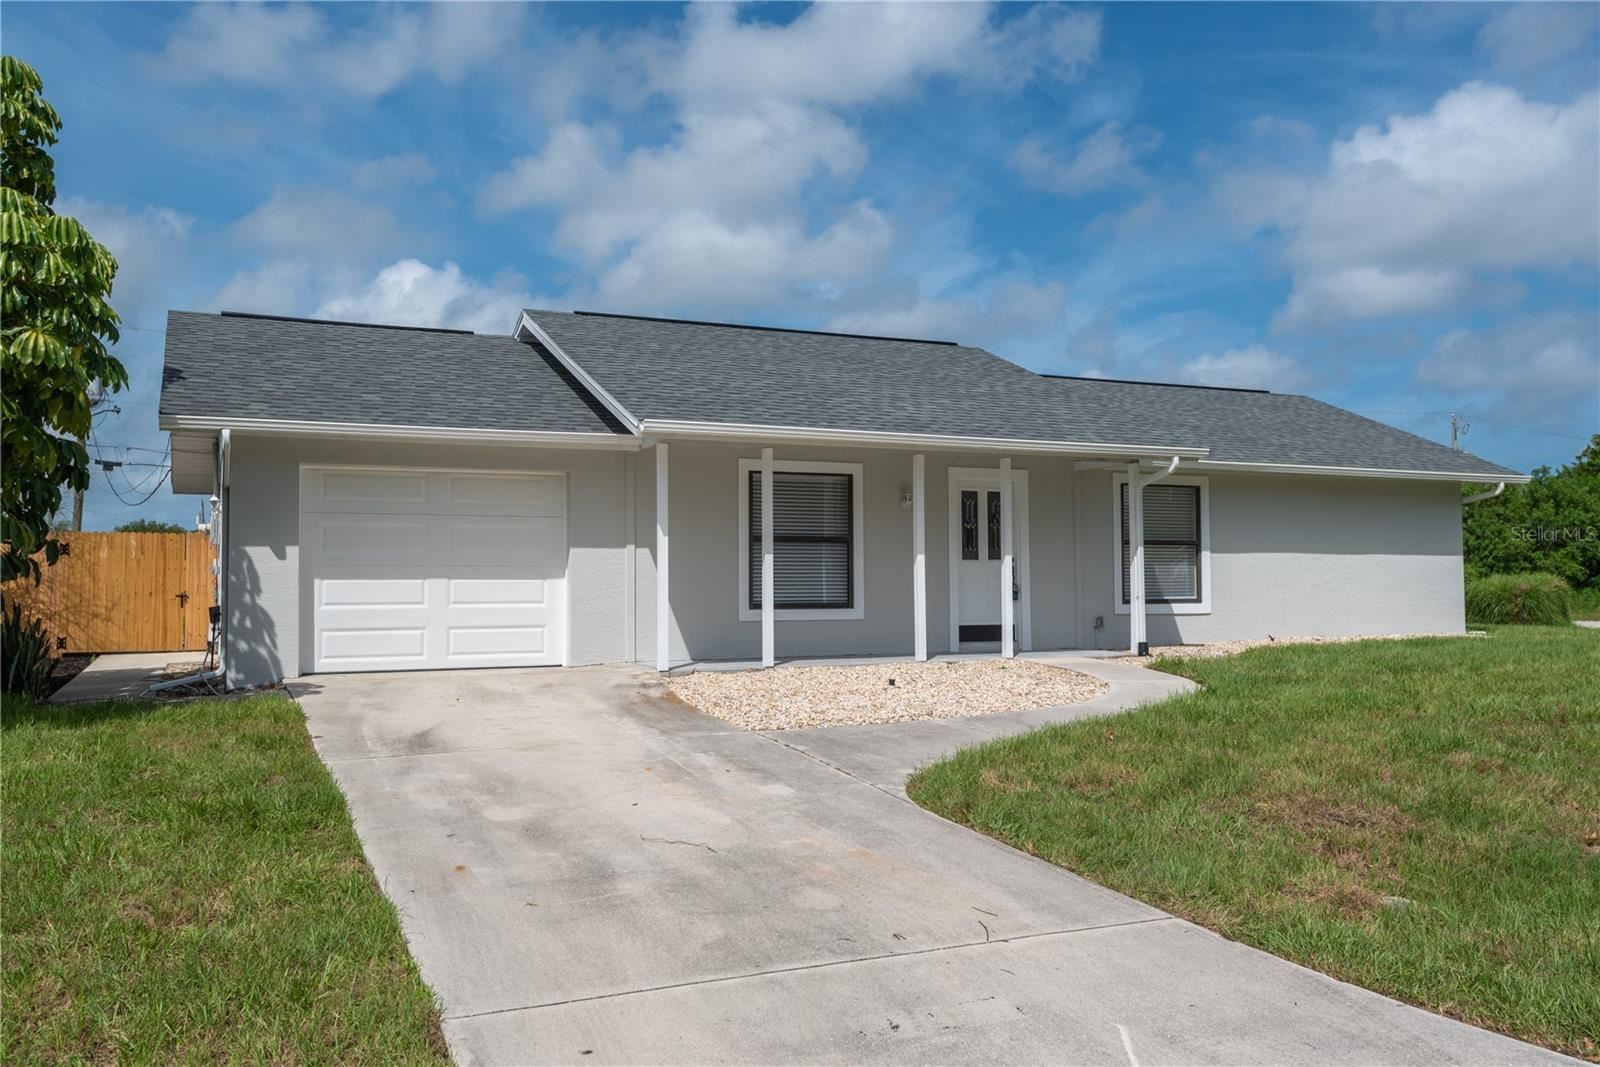 Photo of 7287 WICKLOW LANE, ENGLEWOOD, FL 34224 (MLS # C7446073)